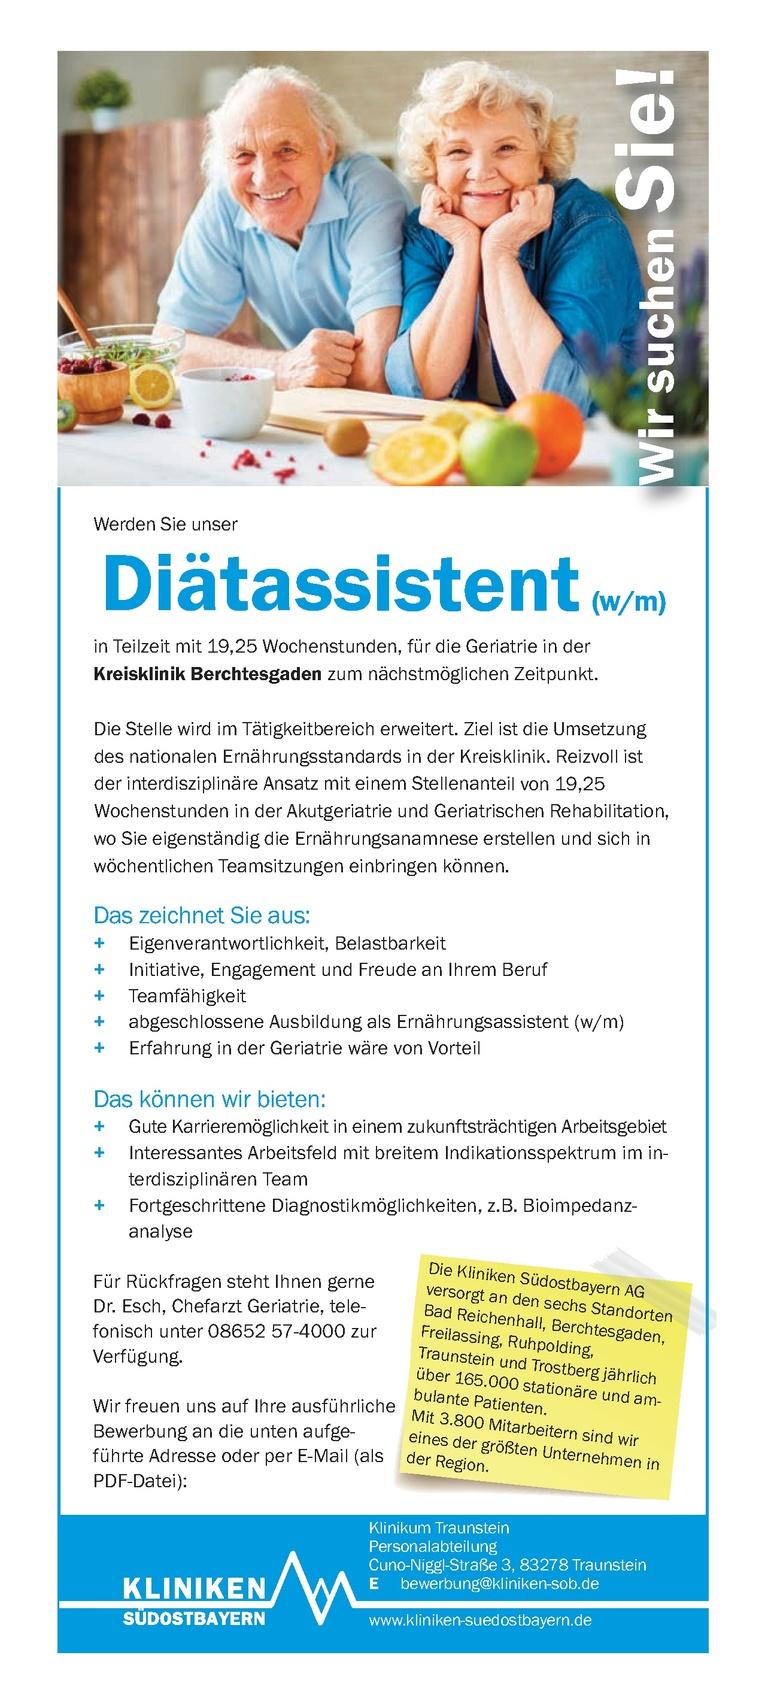 Diätassistent (w/m)